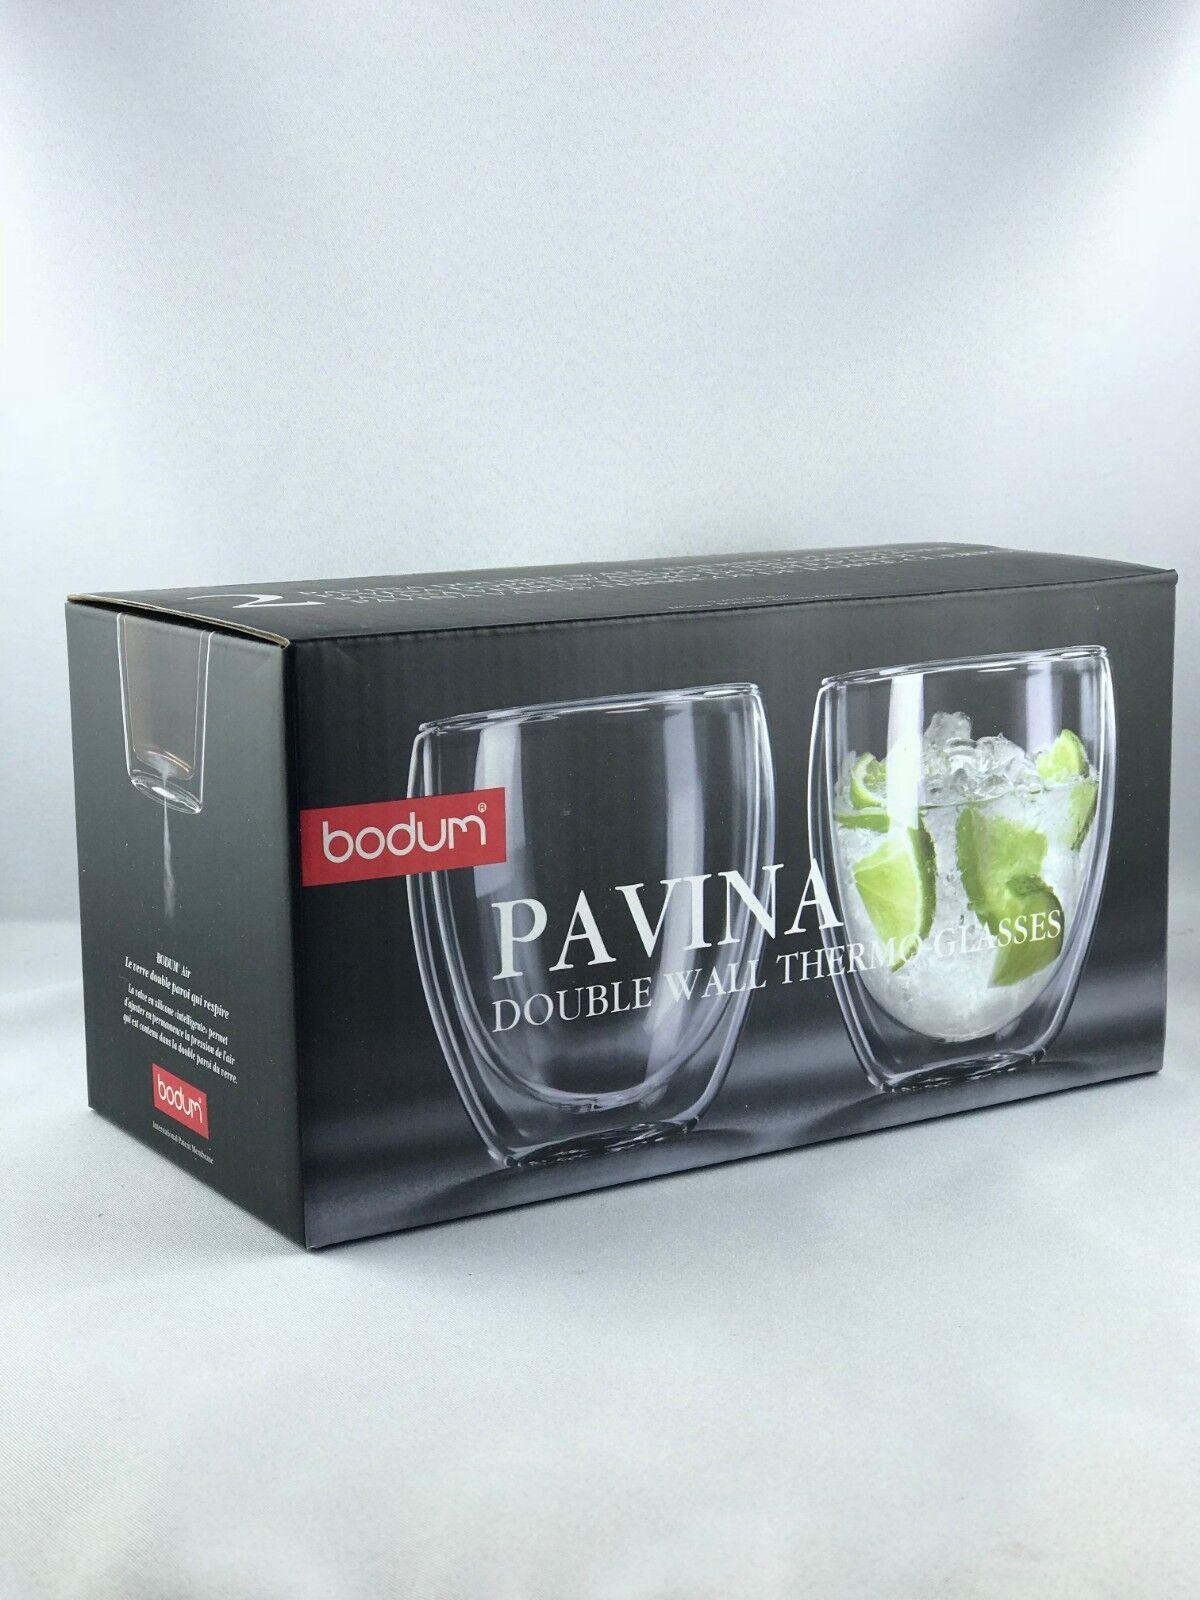 2 x 2er Set Bodum PAVINA Glas doppelwandig 0.25L Neu | Sorgfältig ausgewählte Materialien